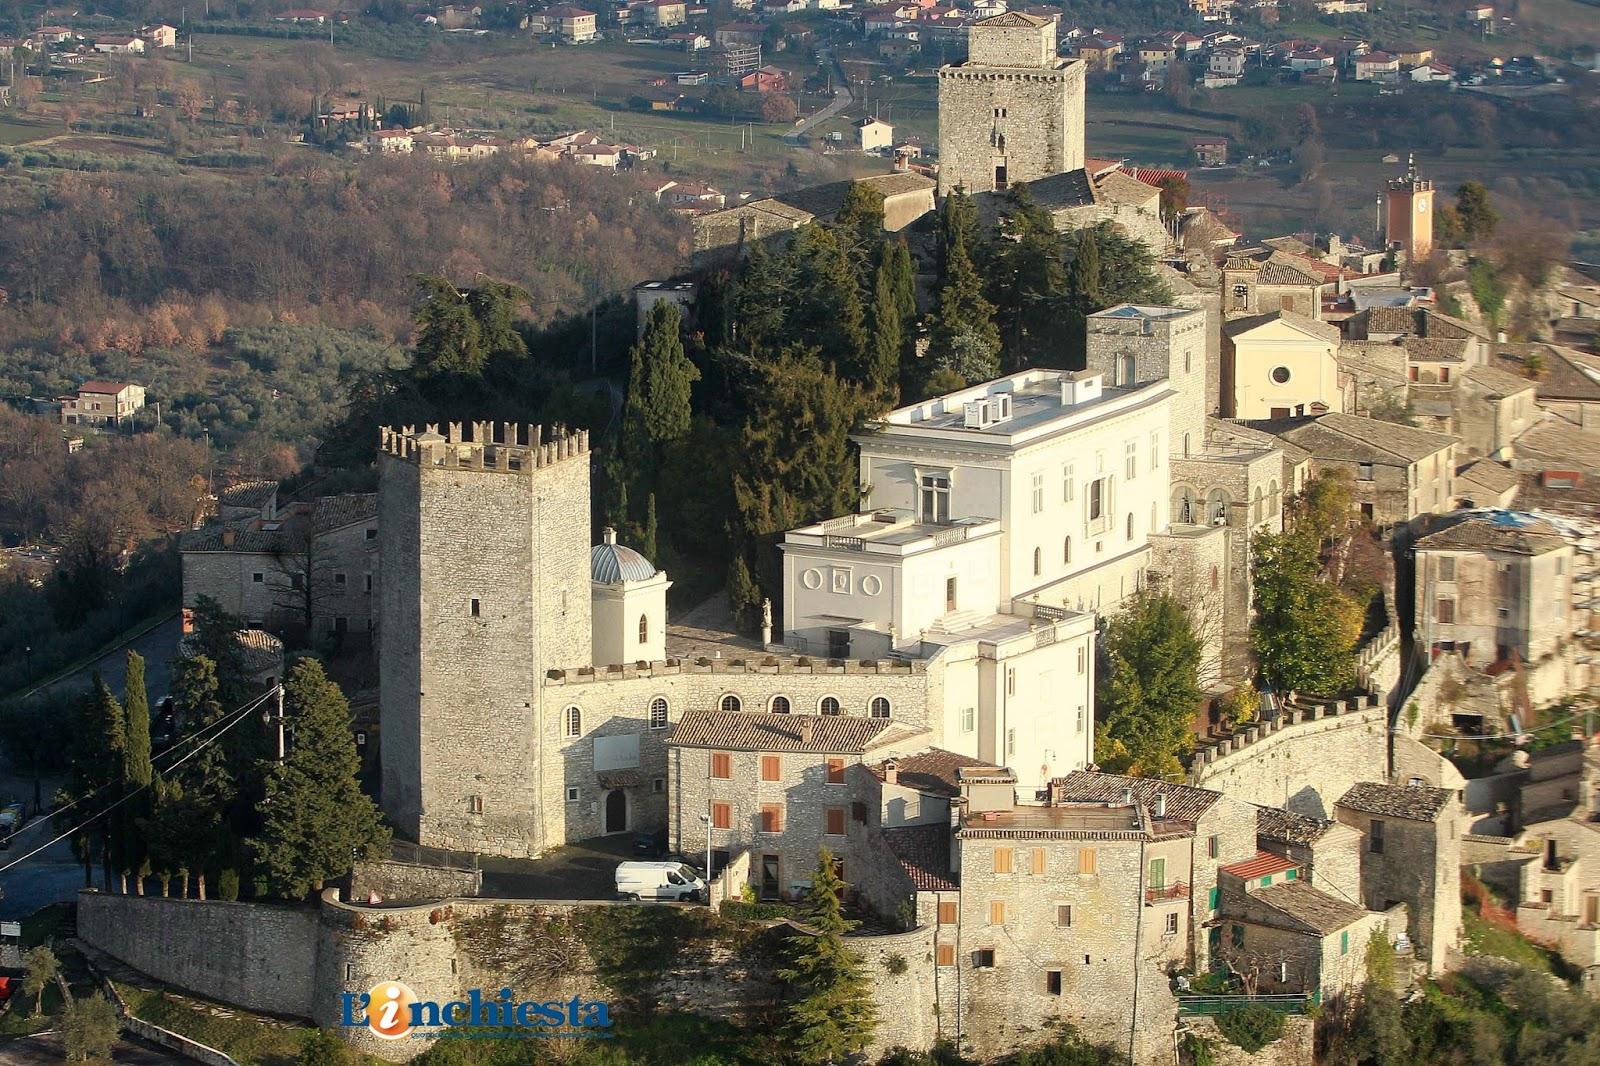 free monte visit monte san giovanni campano fr italy